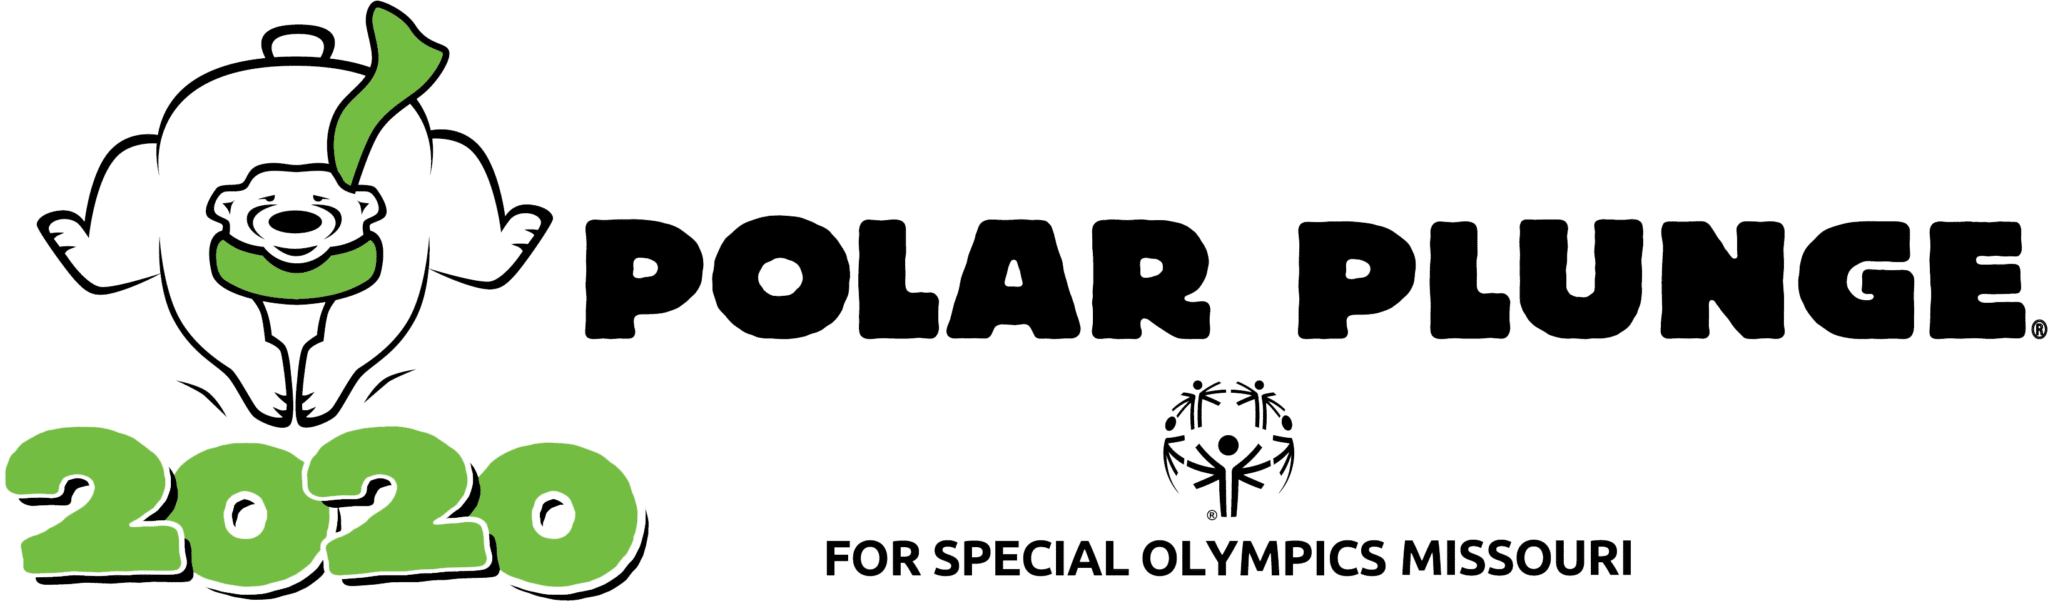 2021 Polar Plunge Logo (Horizontal)